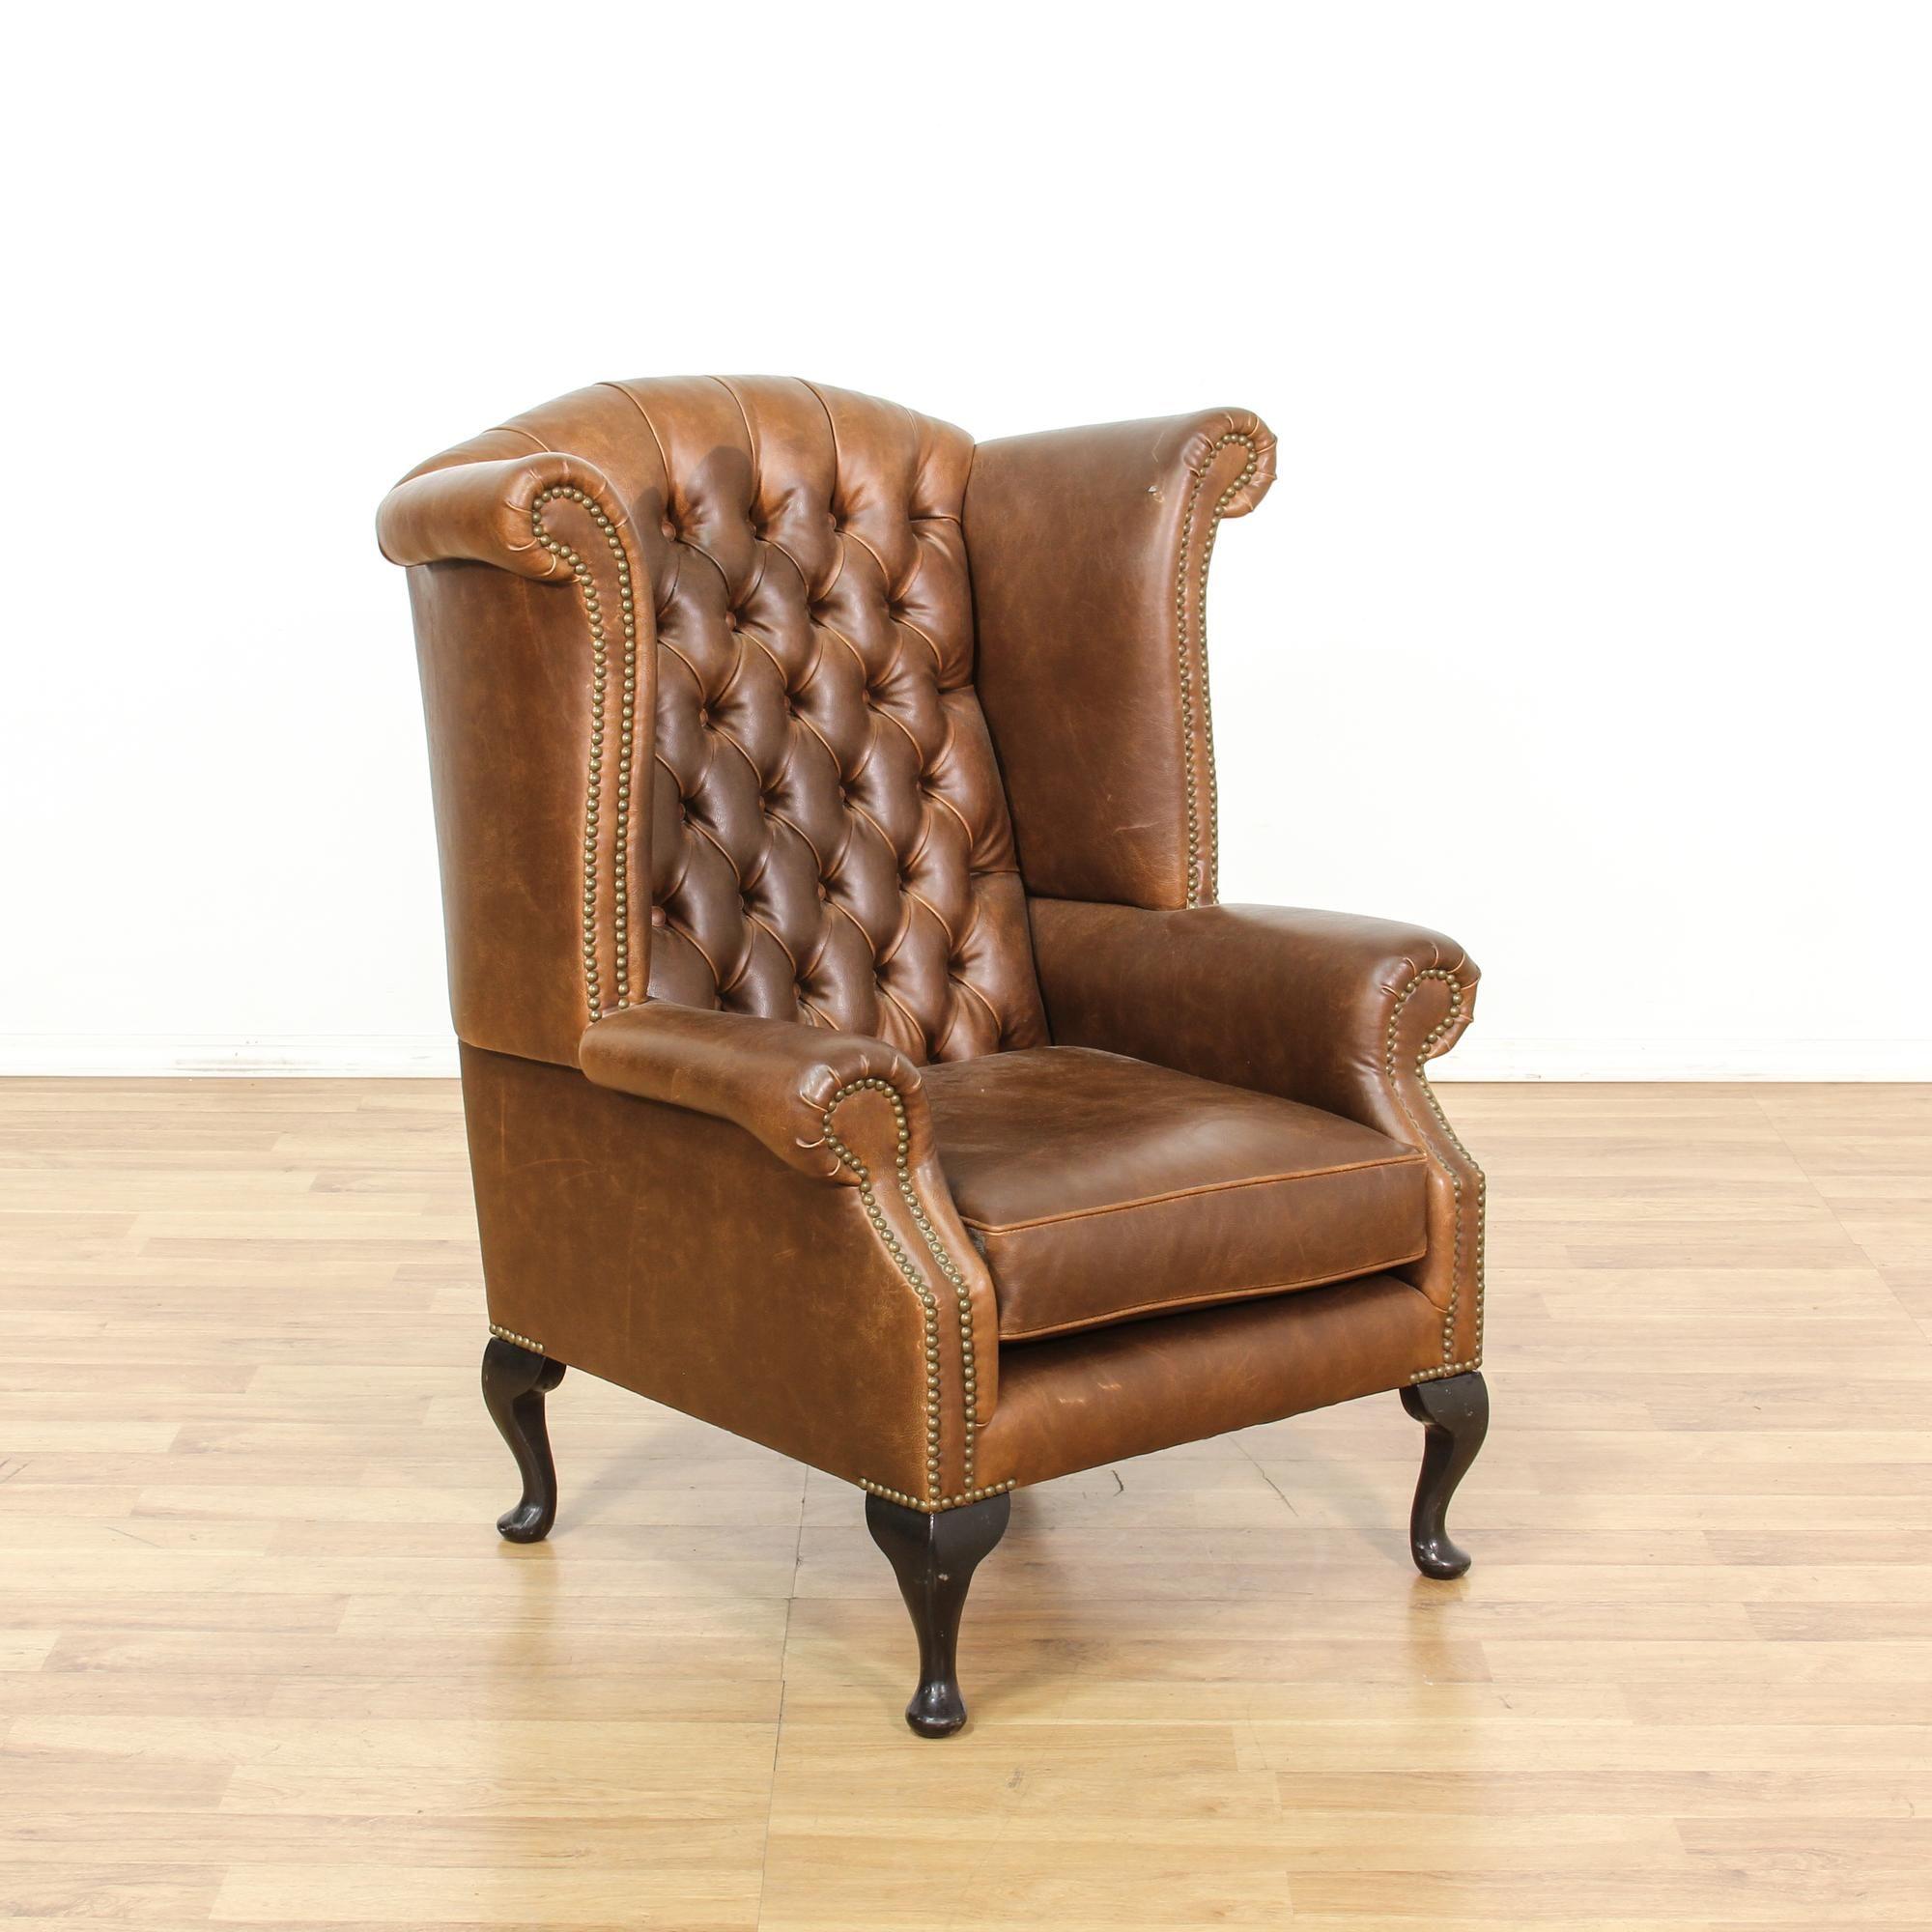 Tufted Brown Leather Studded Wingback Armchair | Loveseat Vintage Furniture  San Diego U0026 Los Angeles